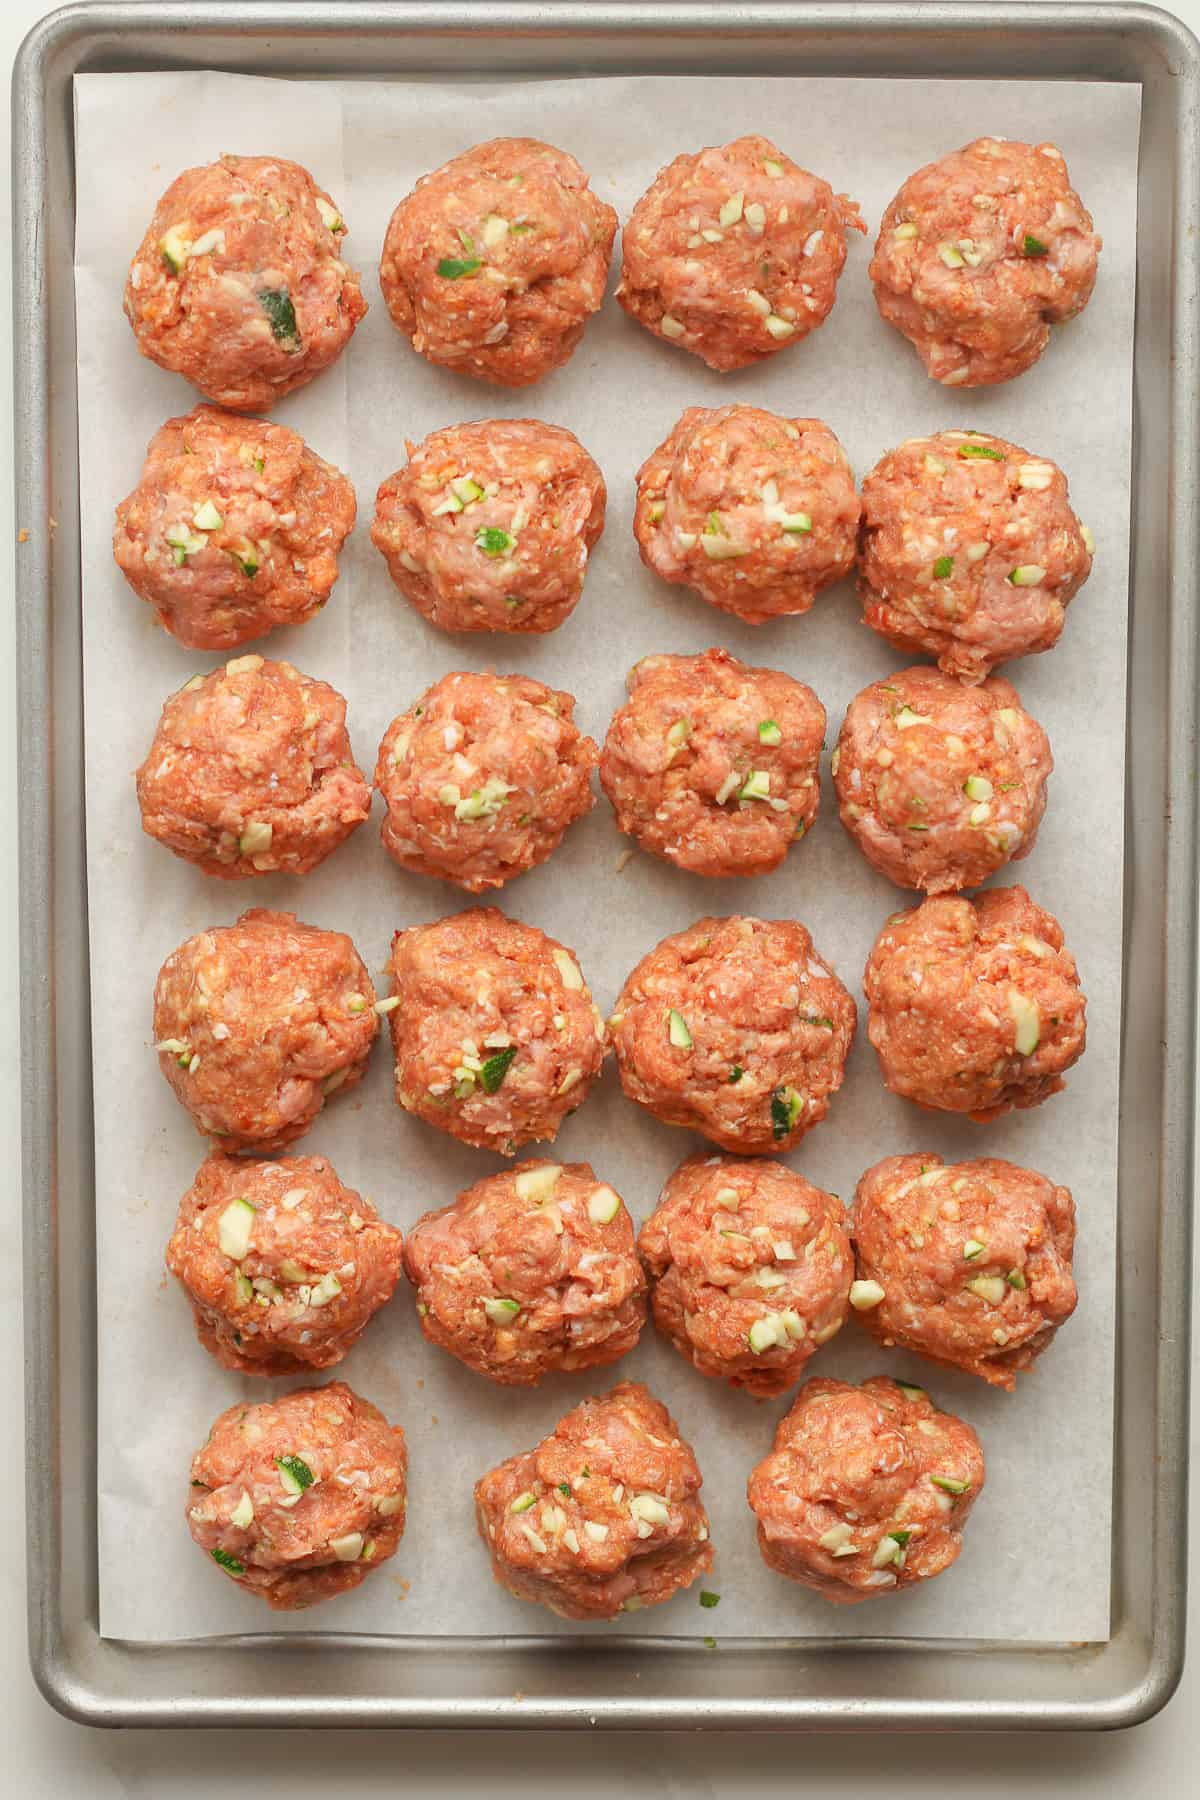 The raw meatballs.